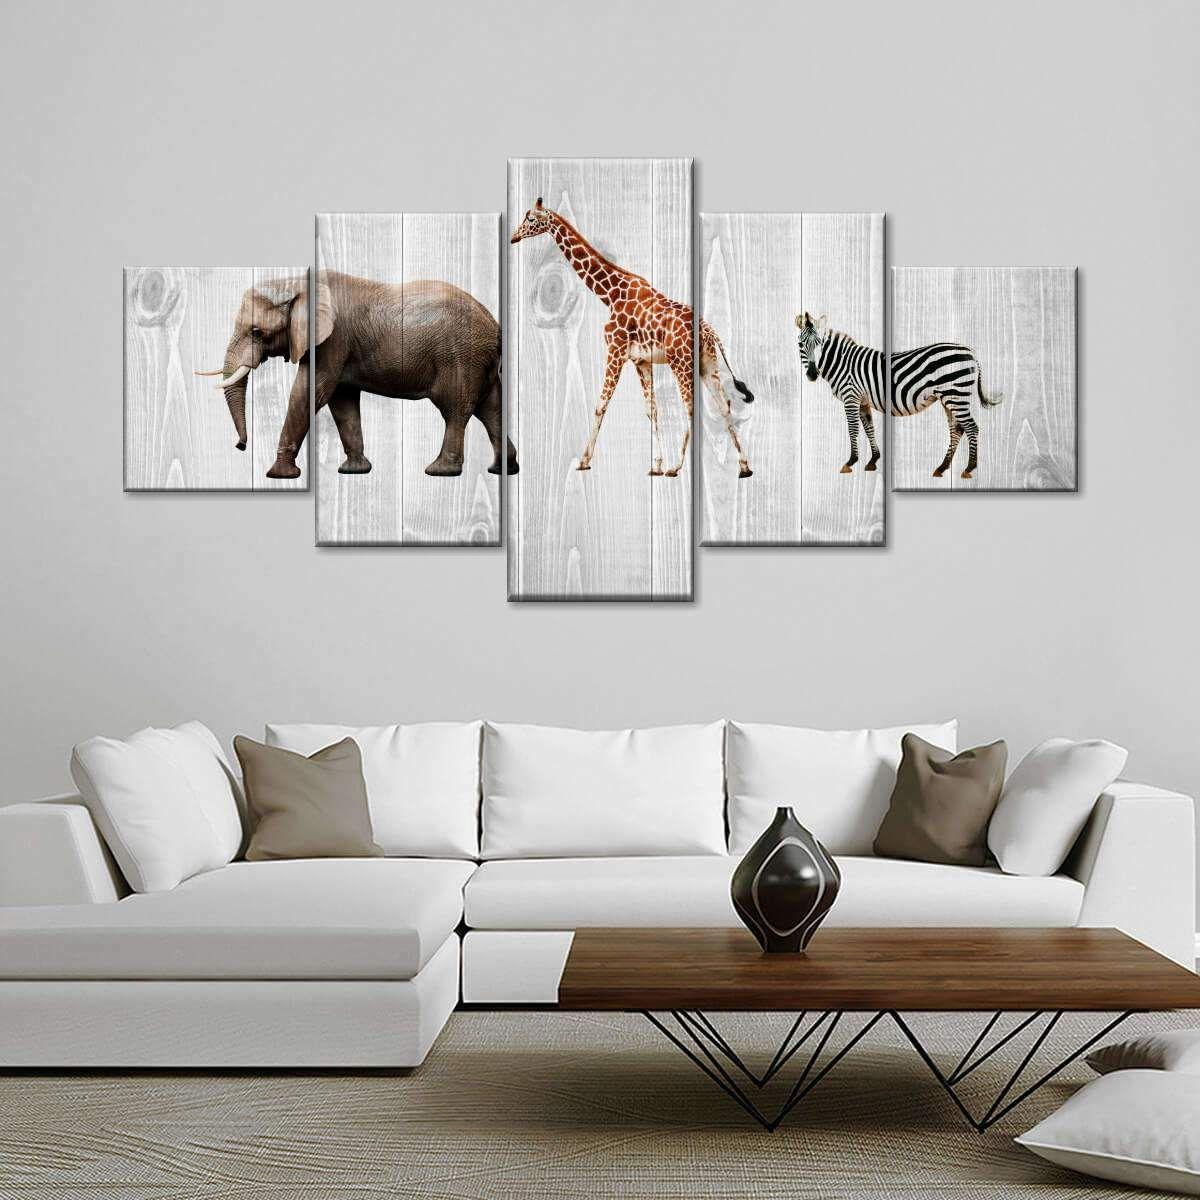 Wooden Safari Wall Art In 2021 Safari Wall Art Animal Wall Art Canvas Wall Art